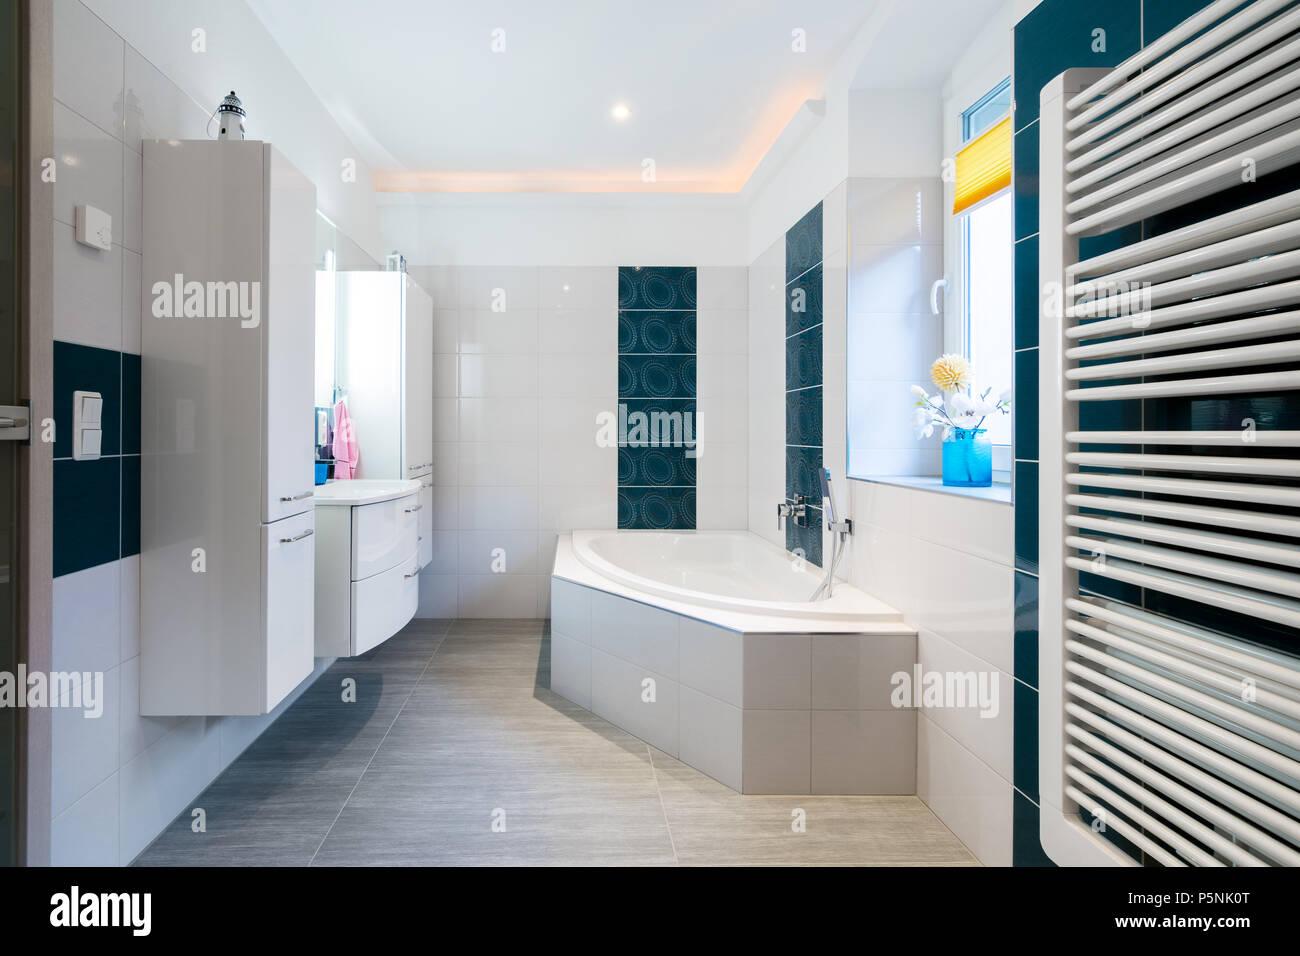 Modern Bathroom - Glossy white and blue tiles - bathtub, sink and ...